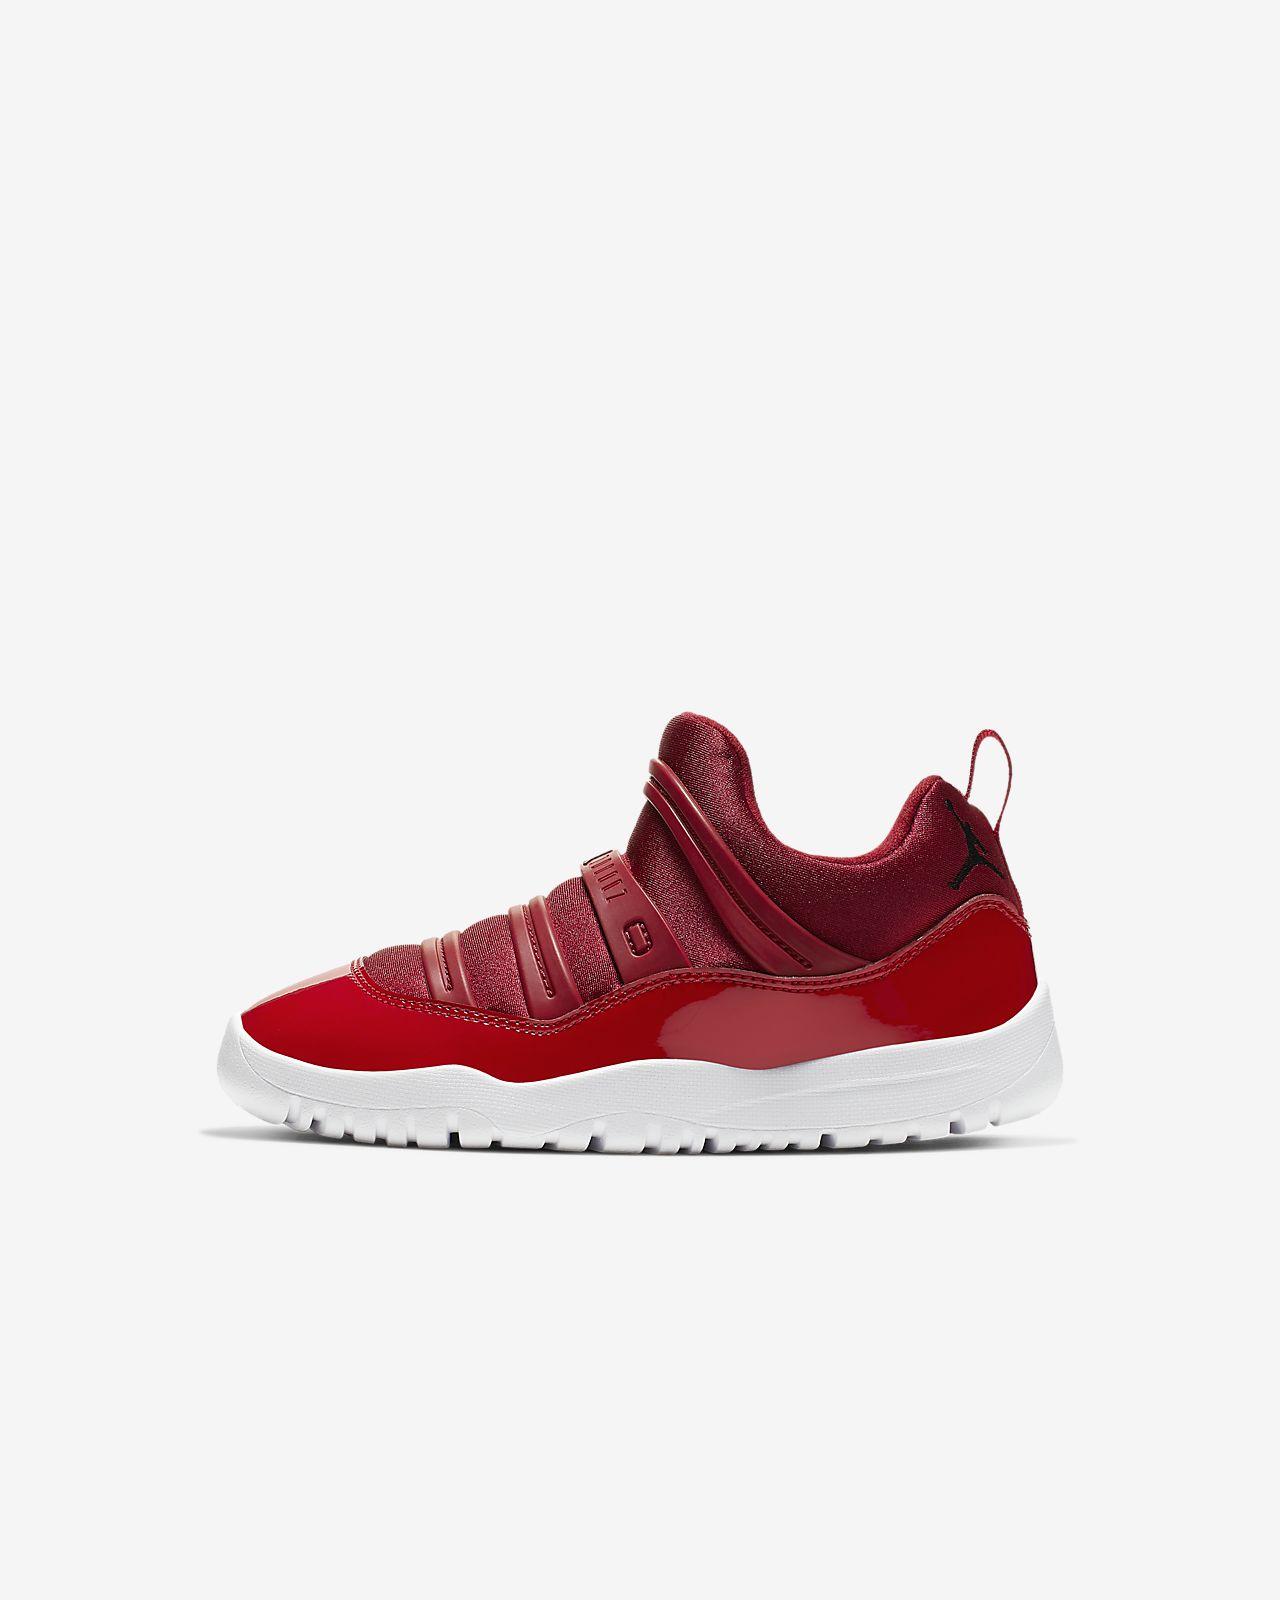 Jordan 11 Retro Little Flex PS 复刻幼童运动童鞋